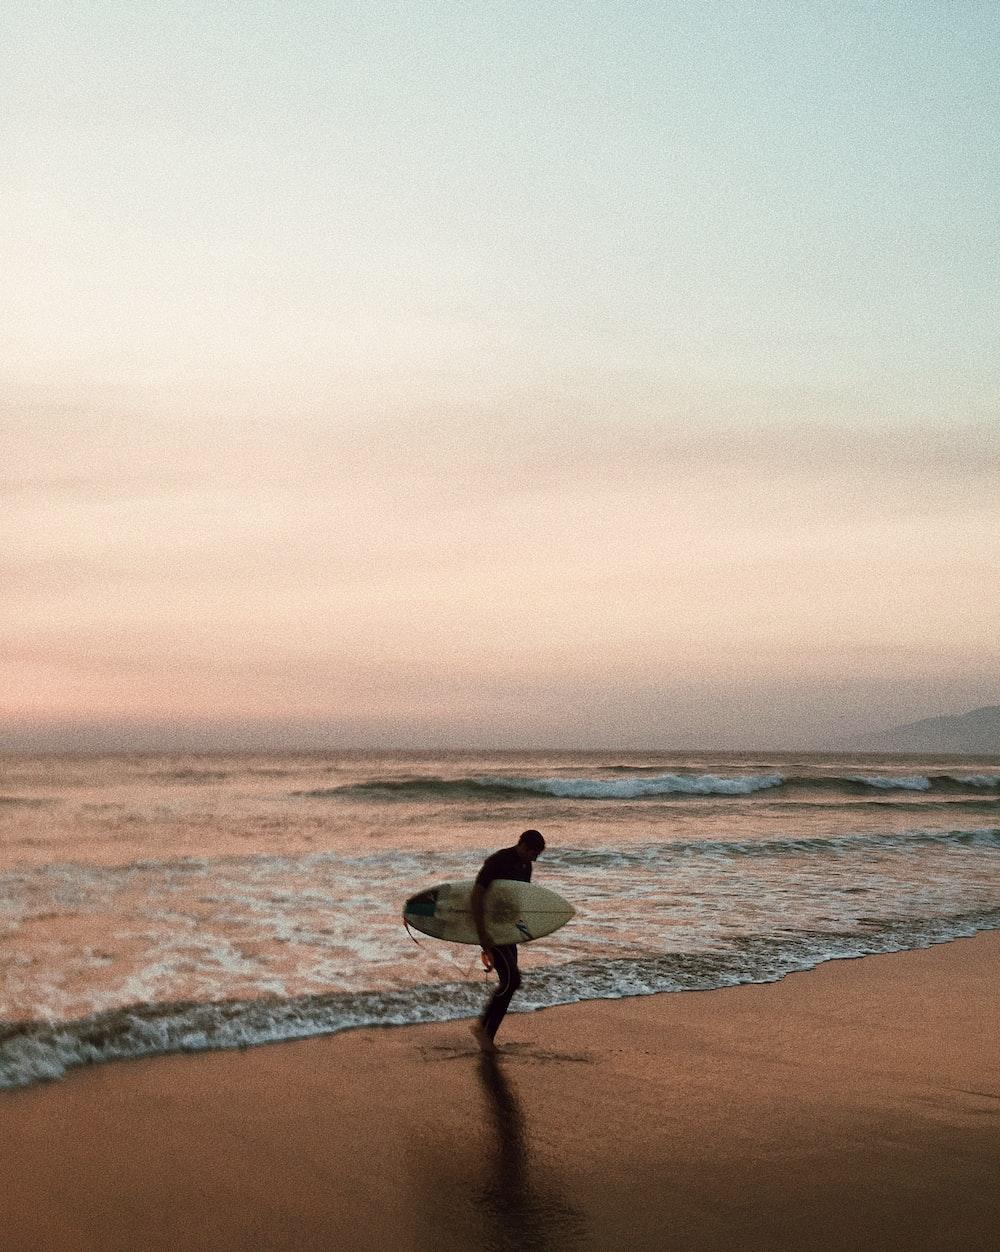 man carrying surfboard on seashore